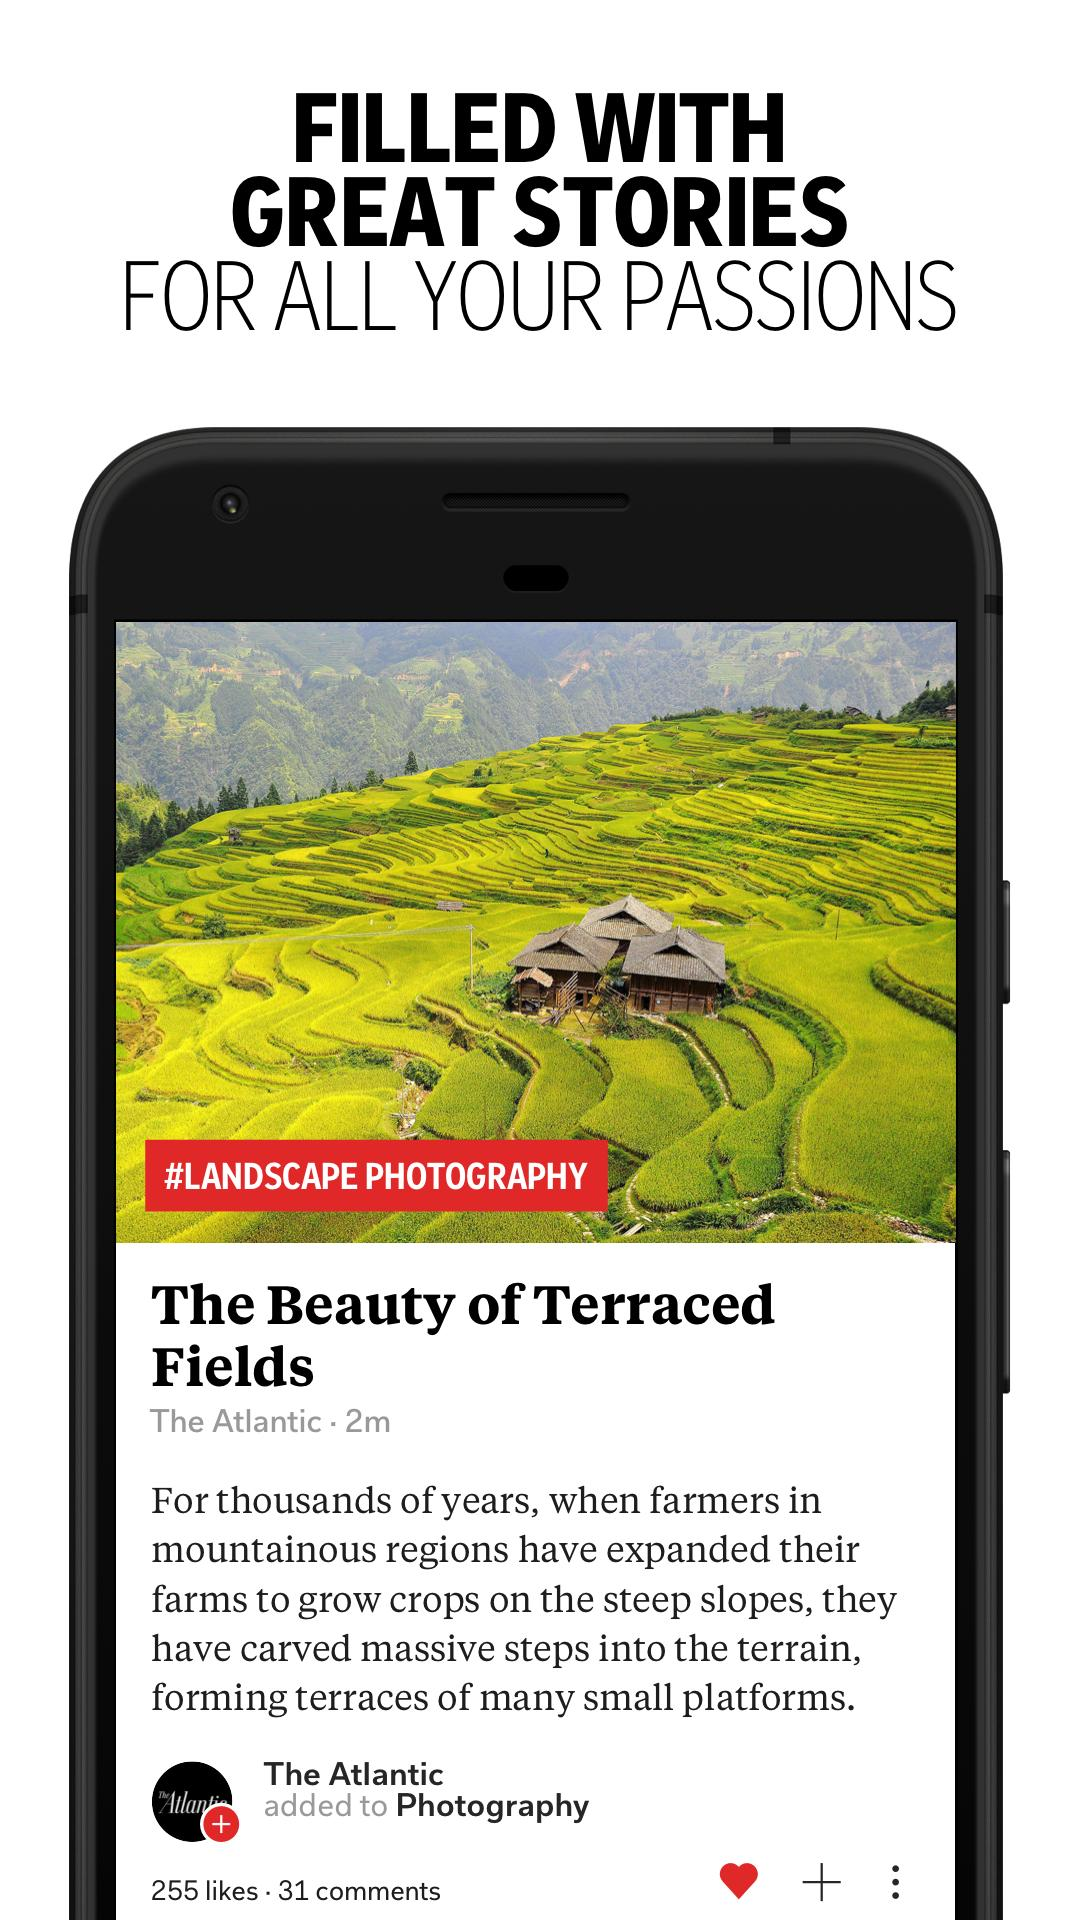 Flipboard Latest News, Top Stories & Lifestyle 4.2.59 Screenshot 3